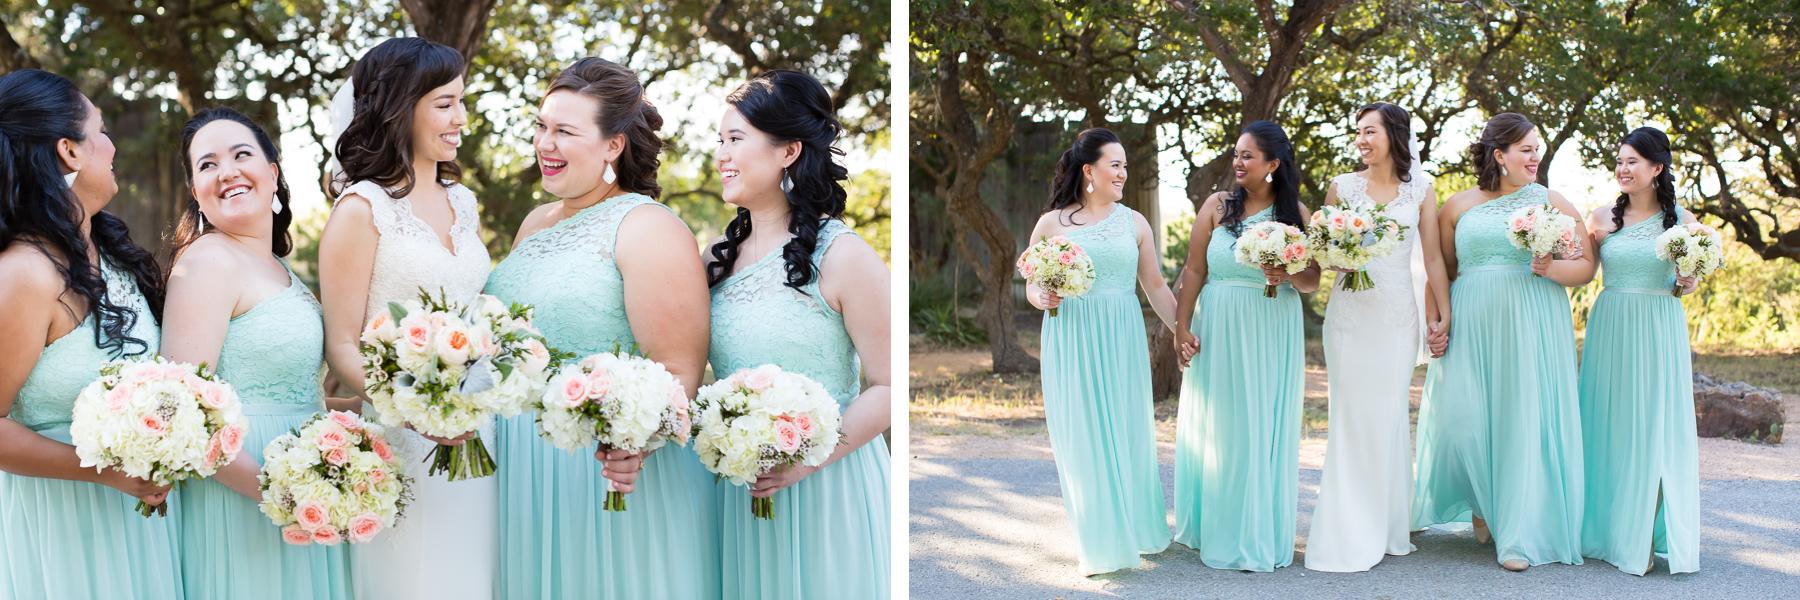 bridal-party-photographs-terrace-club-austin.jpg